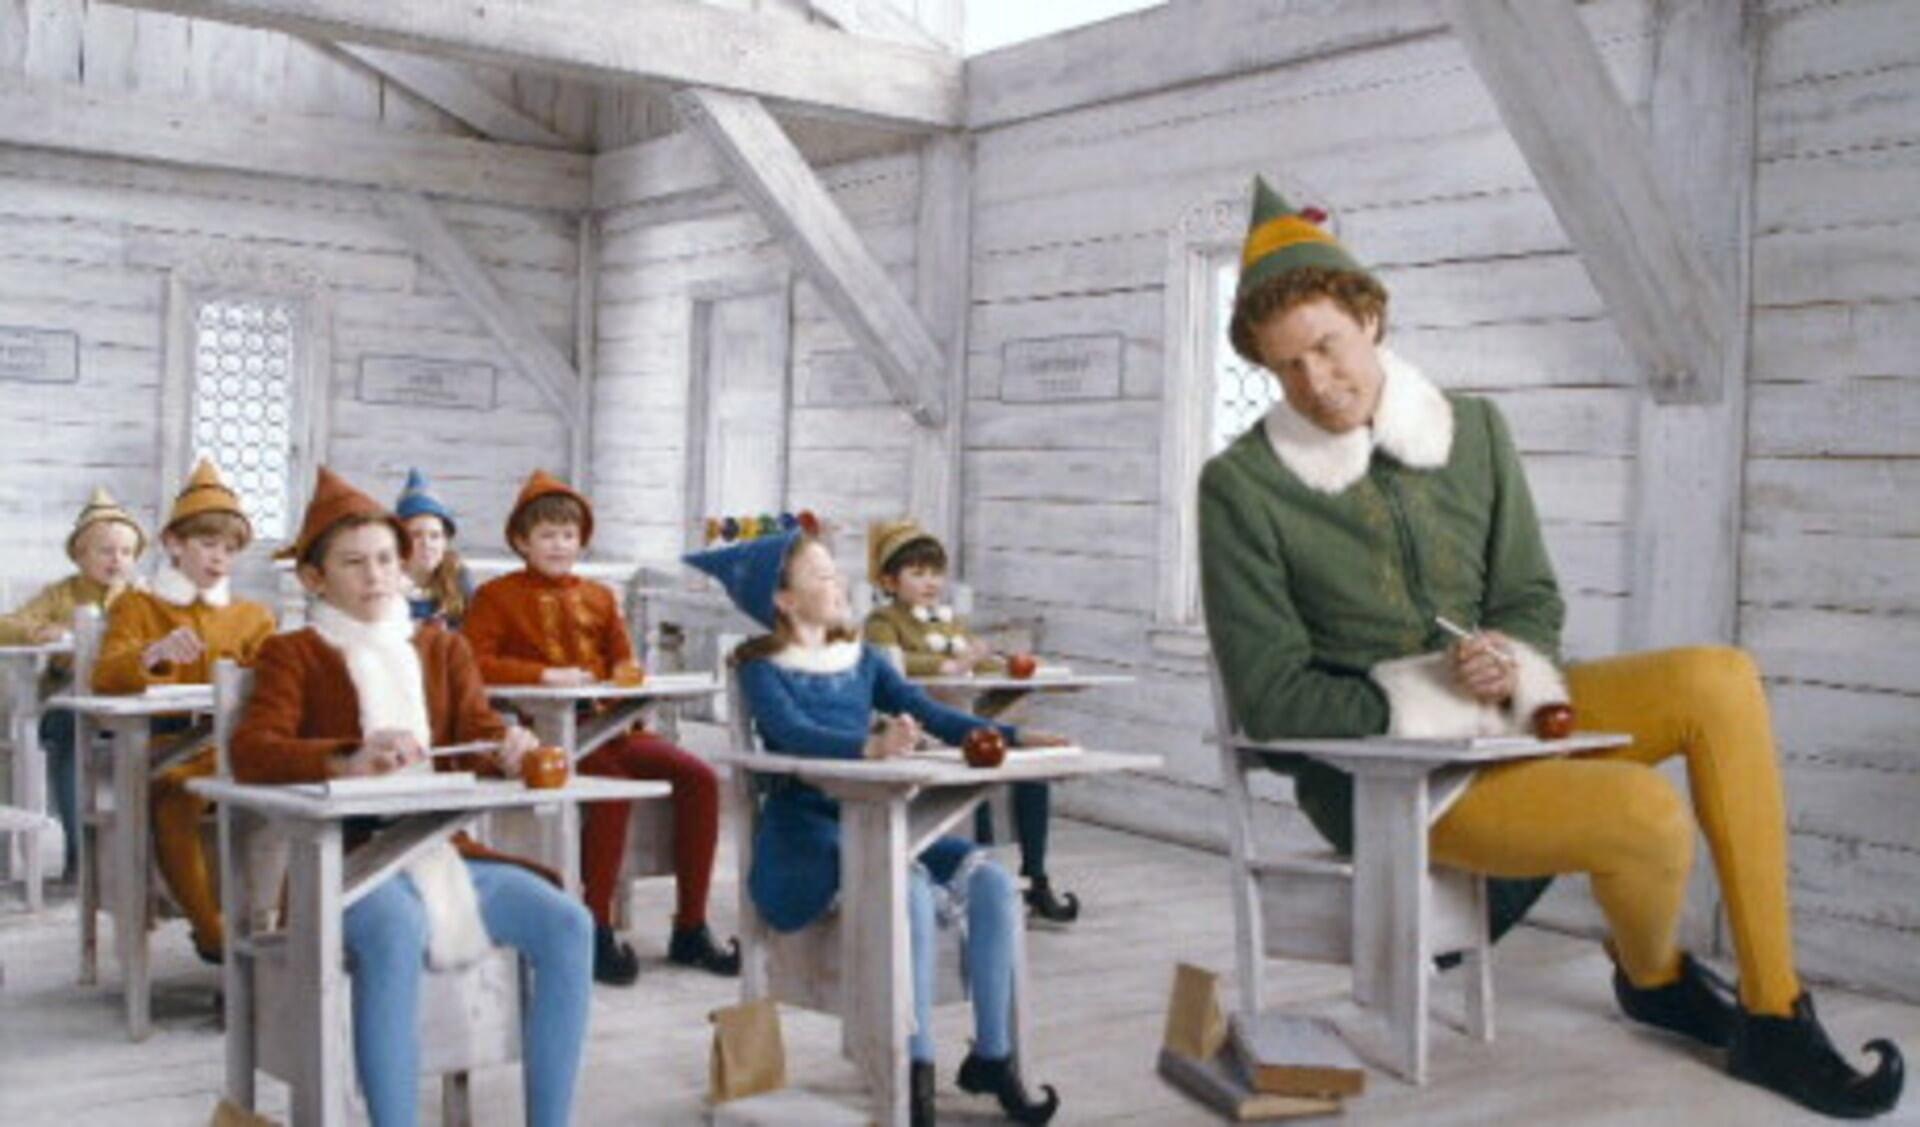 Elf - Image 33